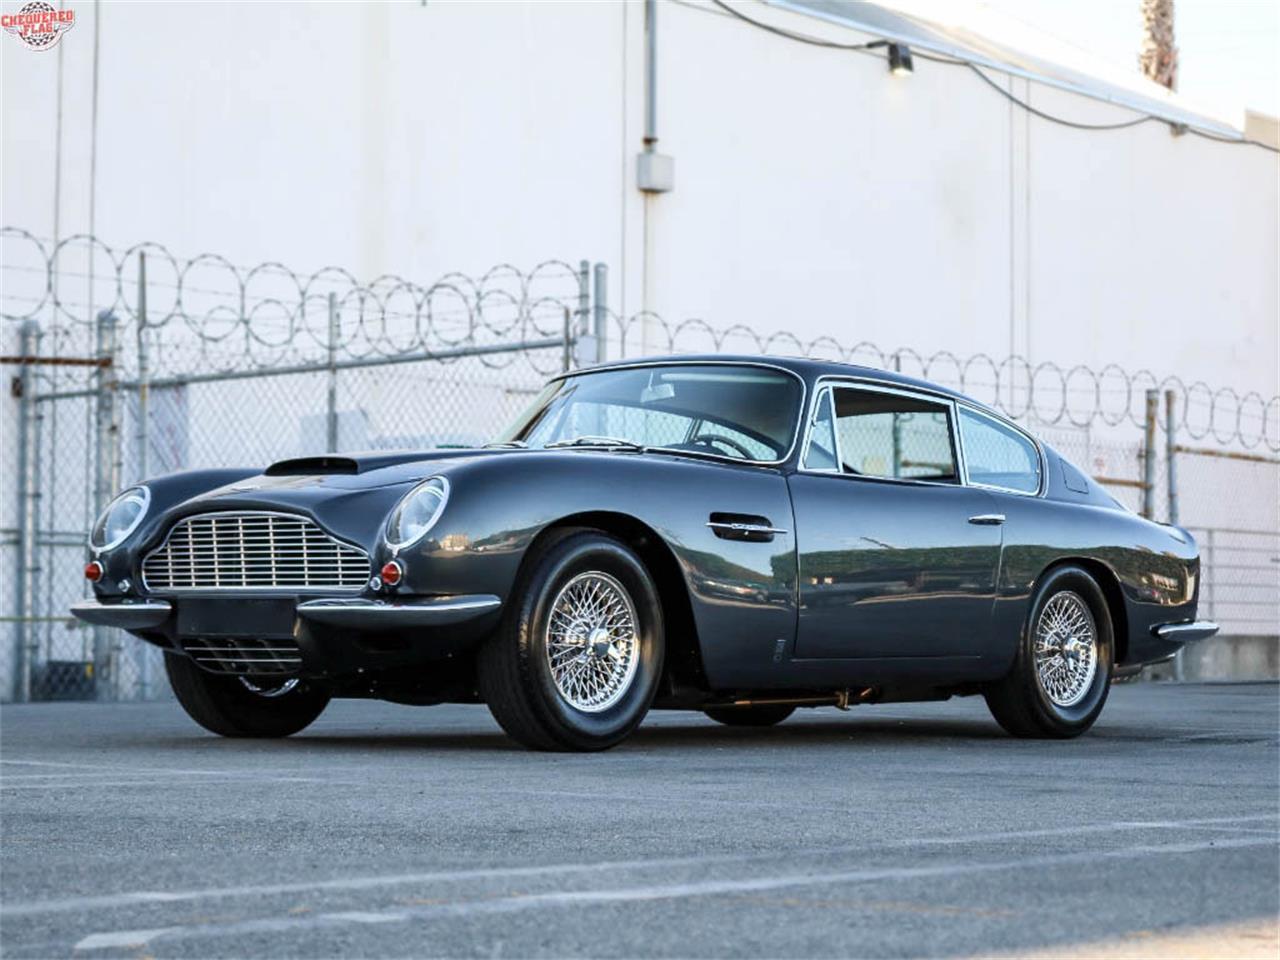 1967 Aston Martin Db6 For Sale In Marina Del Rey Ca Classiccarsbay Com